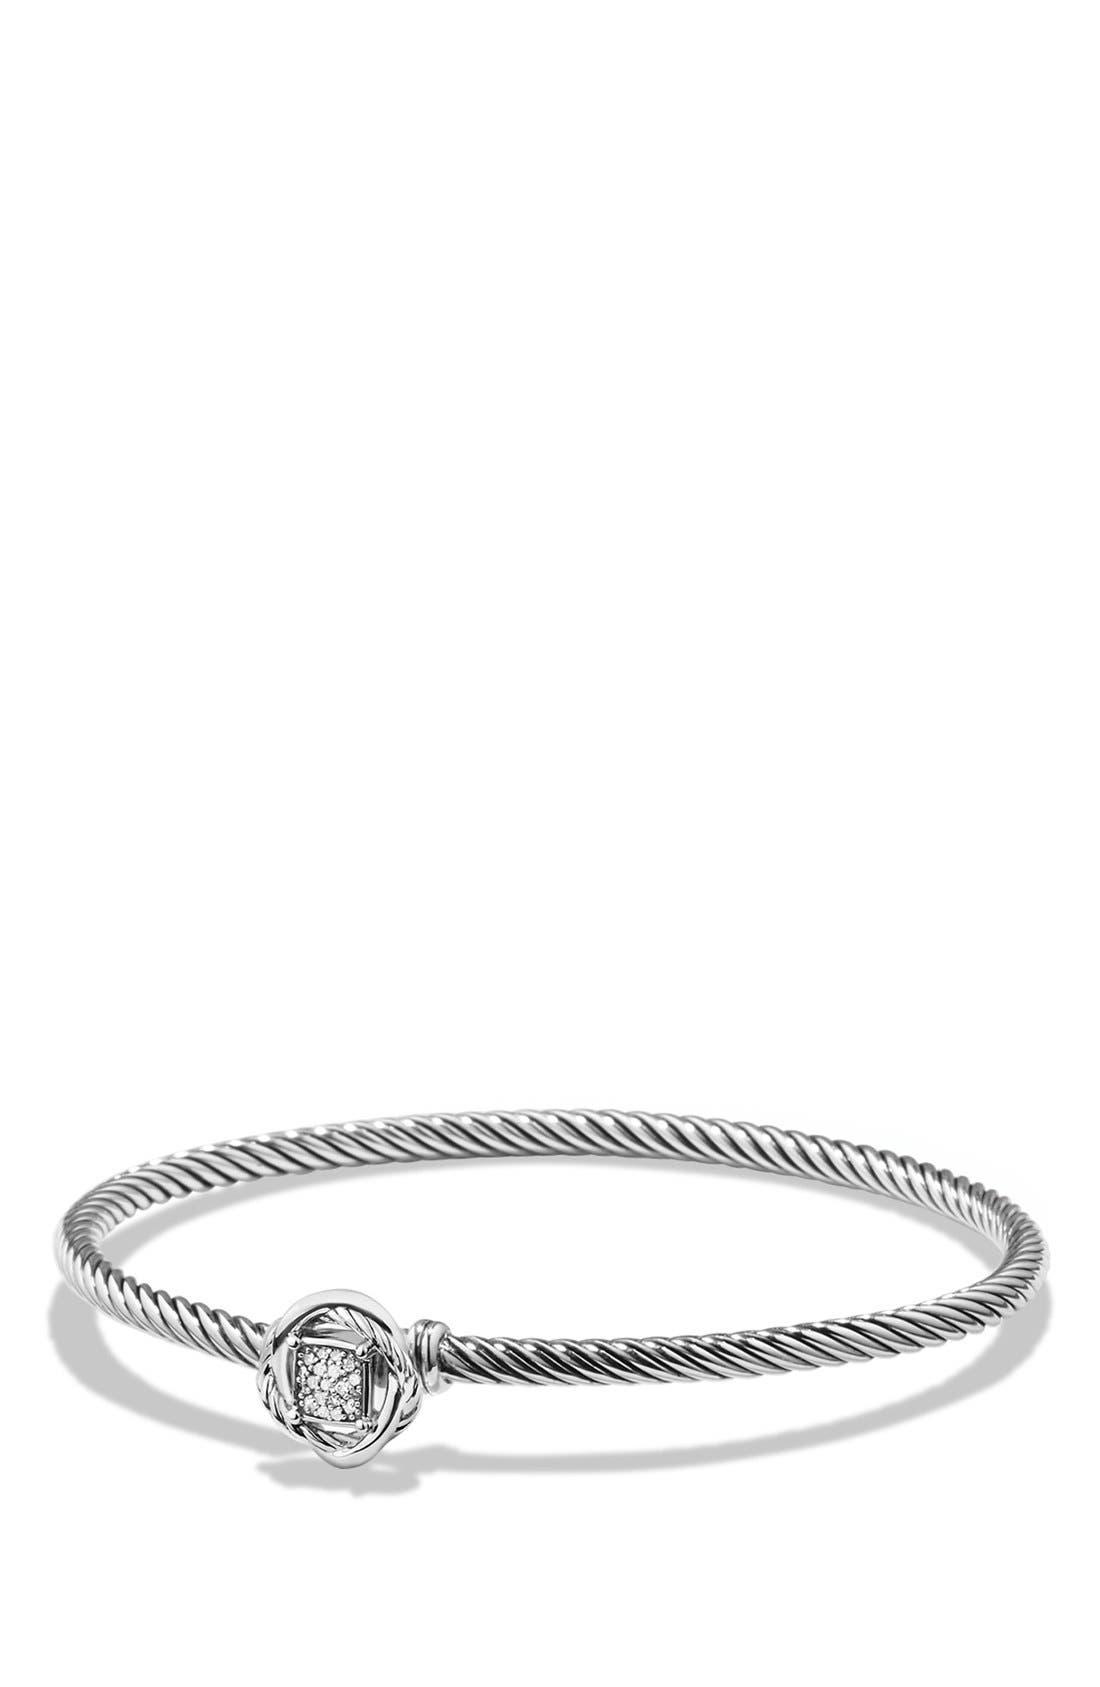 'Infinity' Bracelet with Diamonds,                             Main thumbnail 1, color,                             DIAMOND